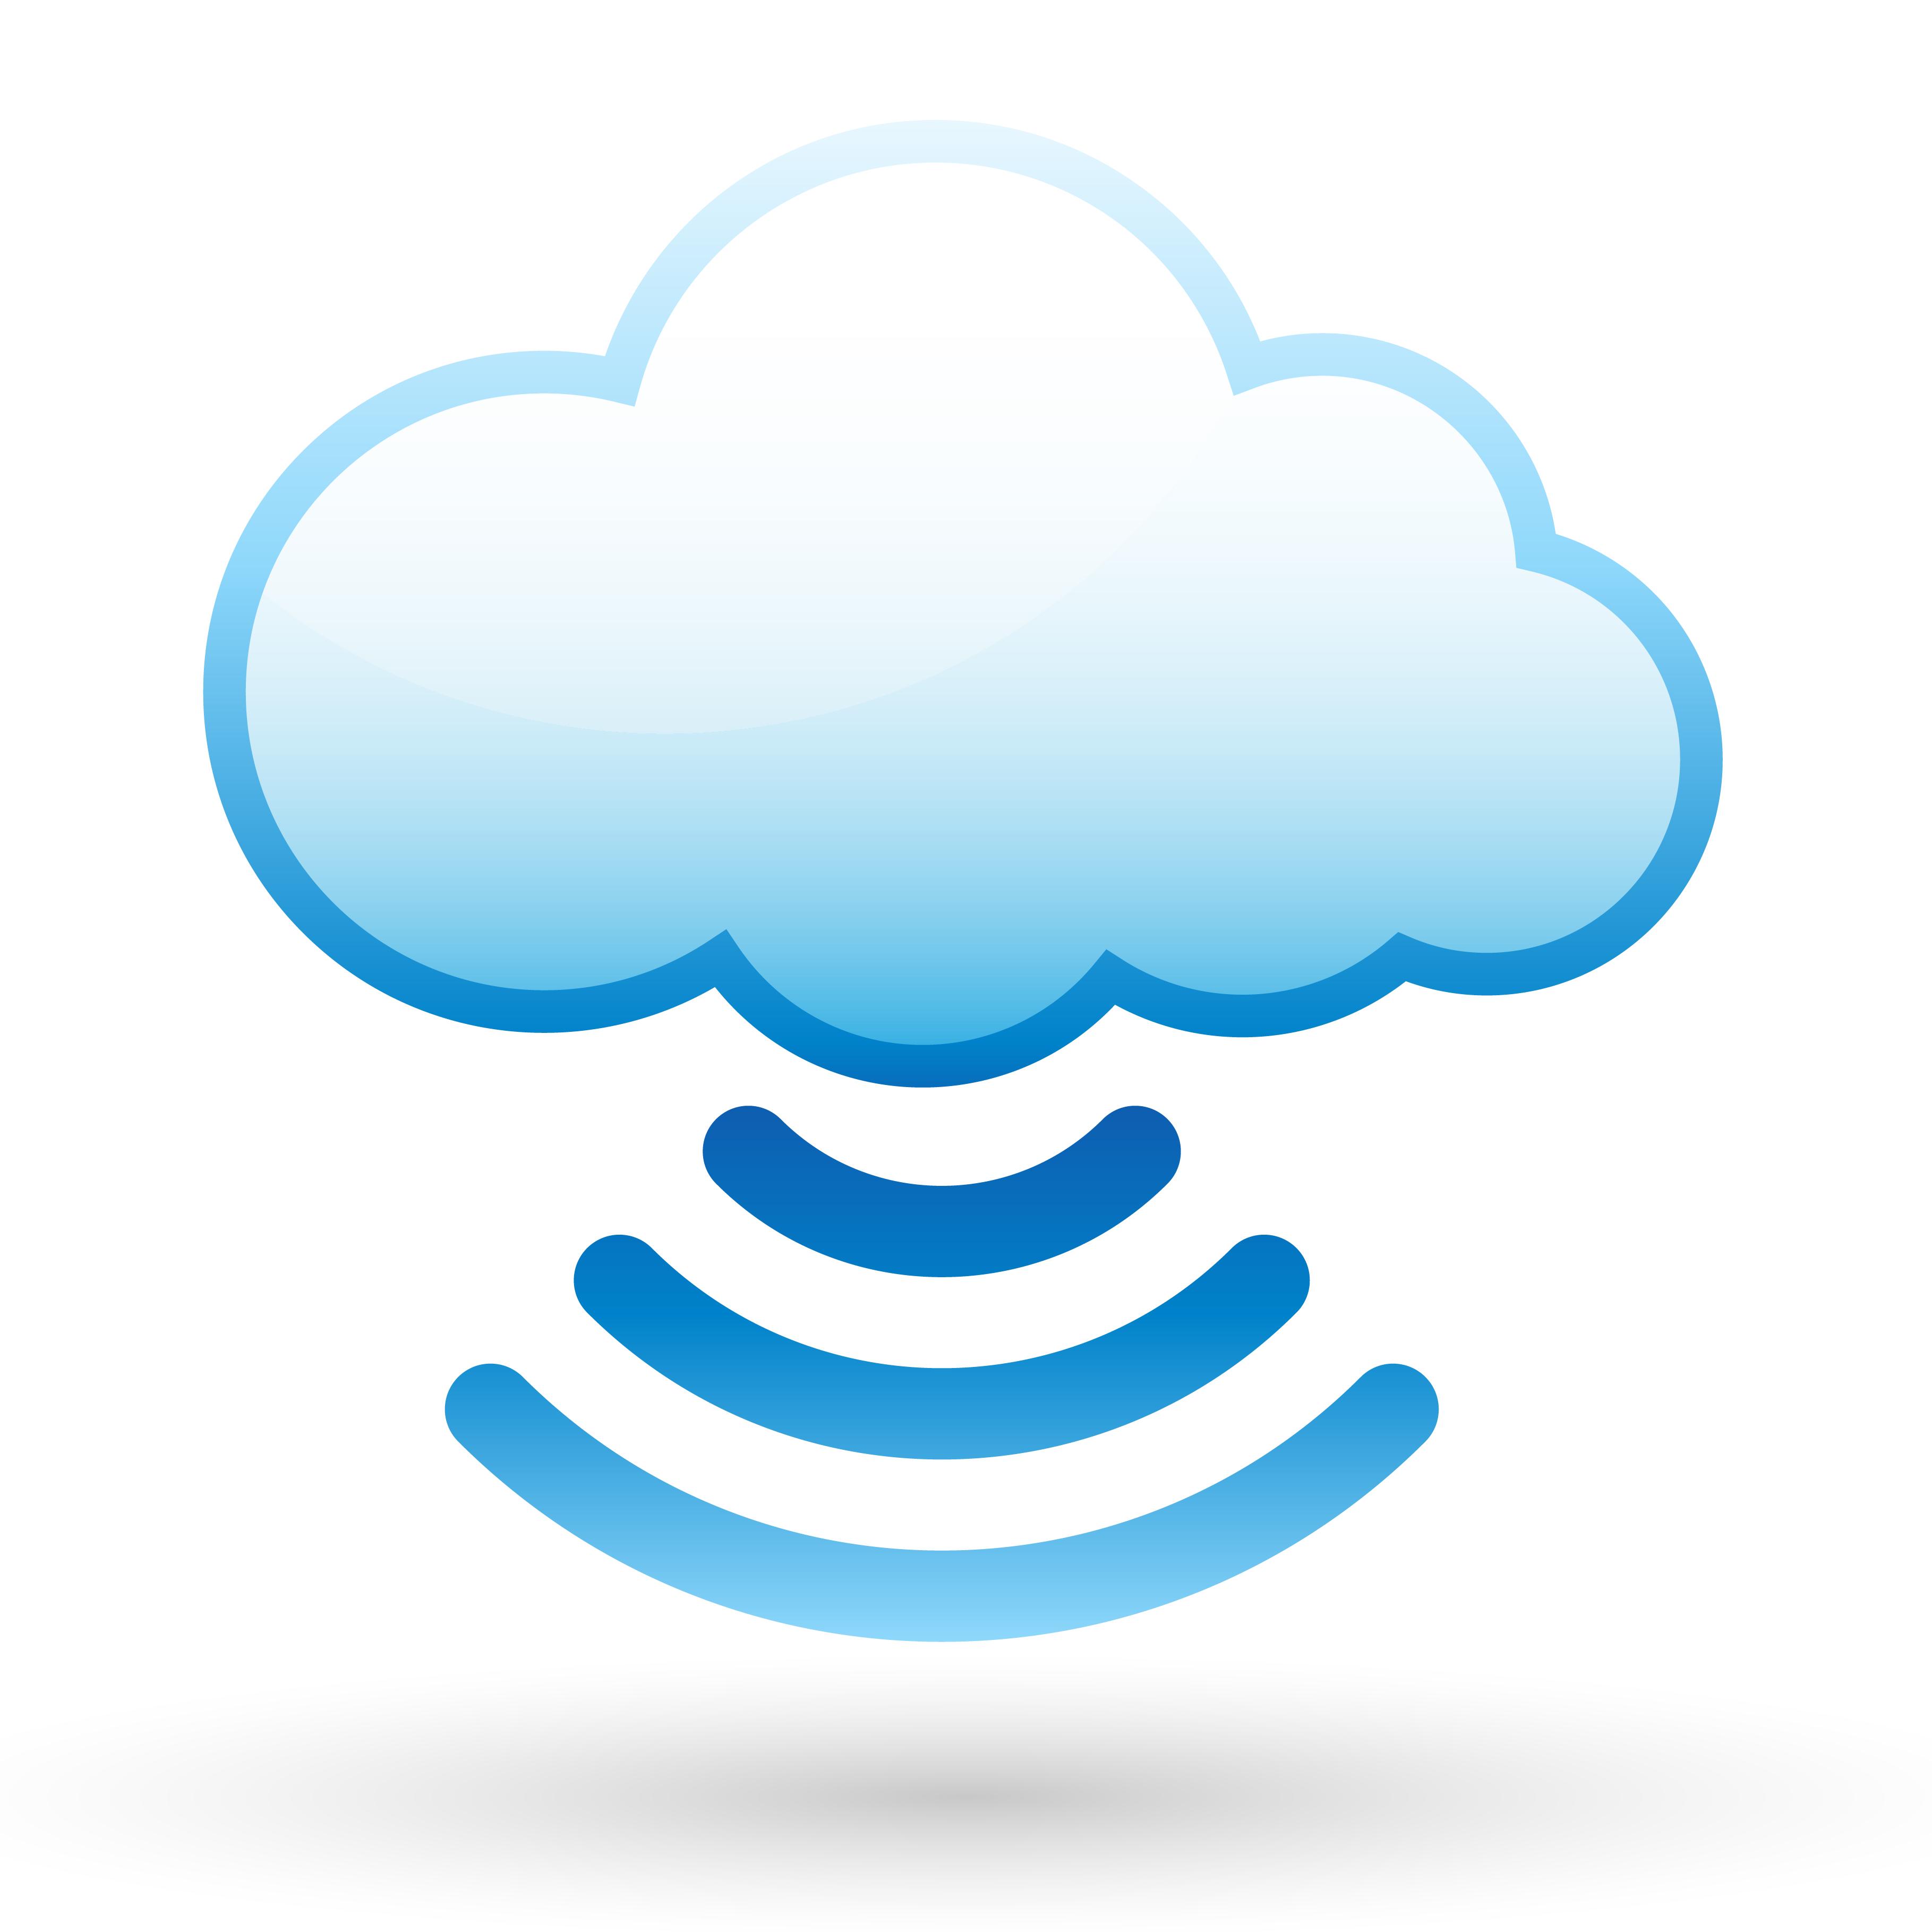 Clouds clipart cloud computing Internet Icon internet icon cloud